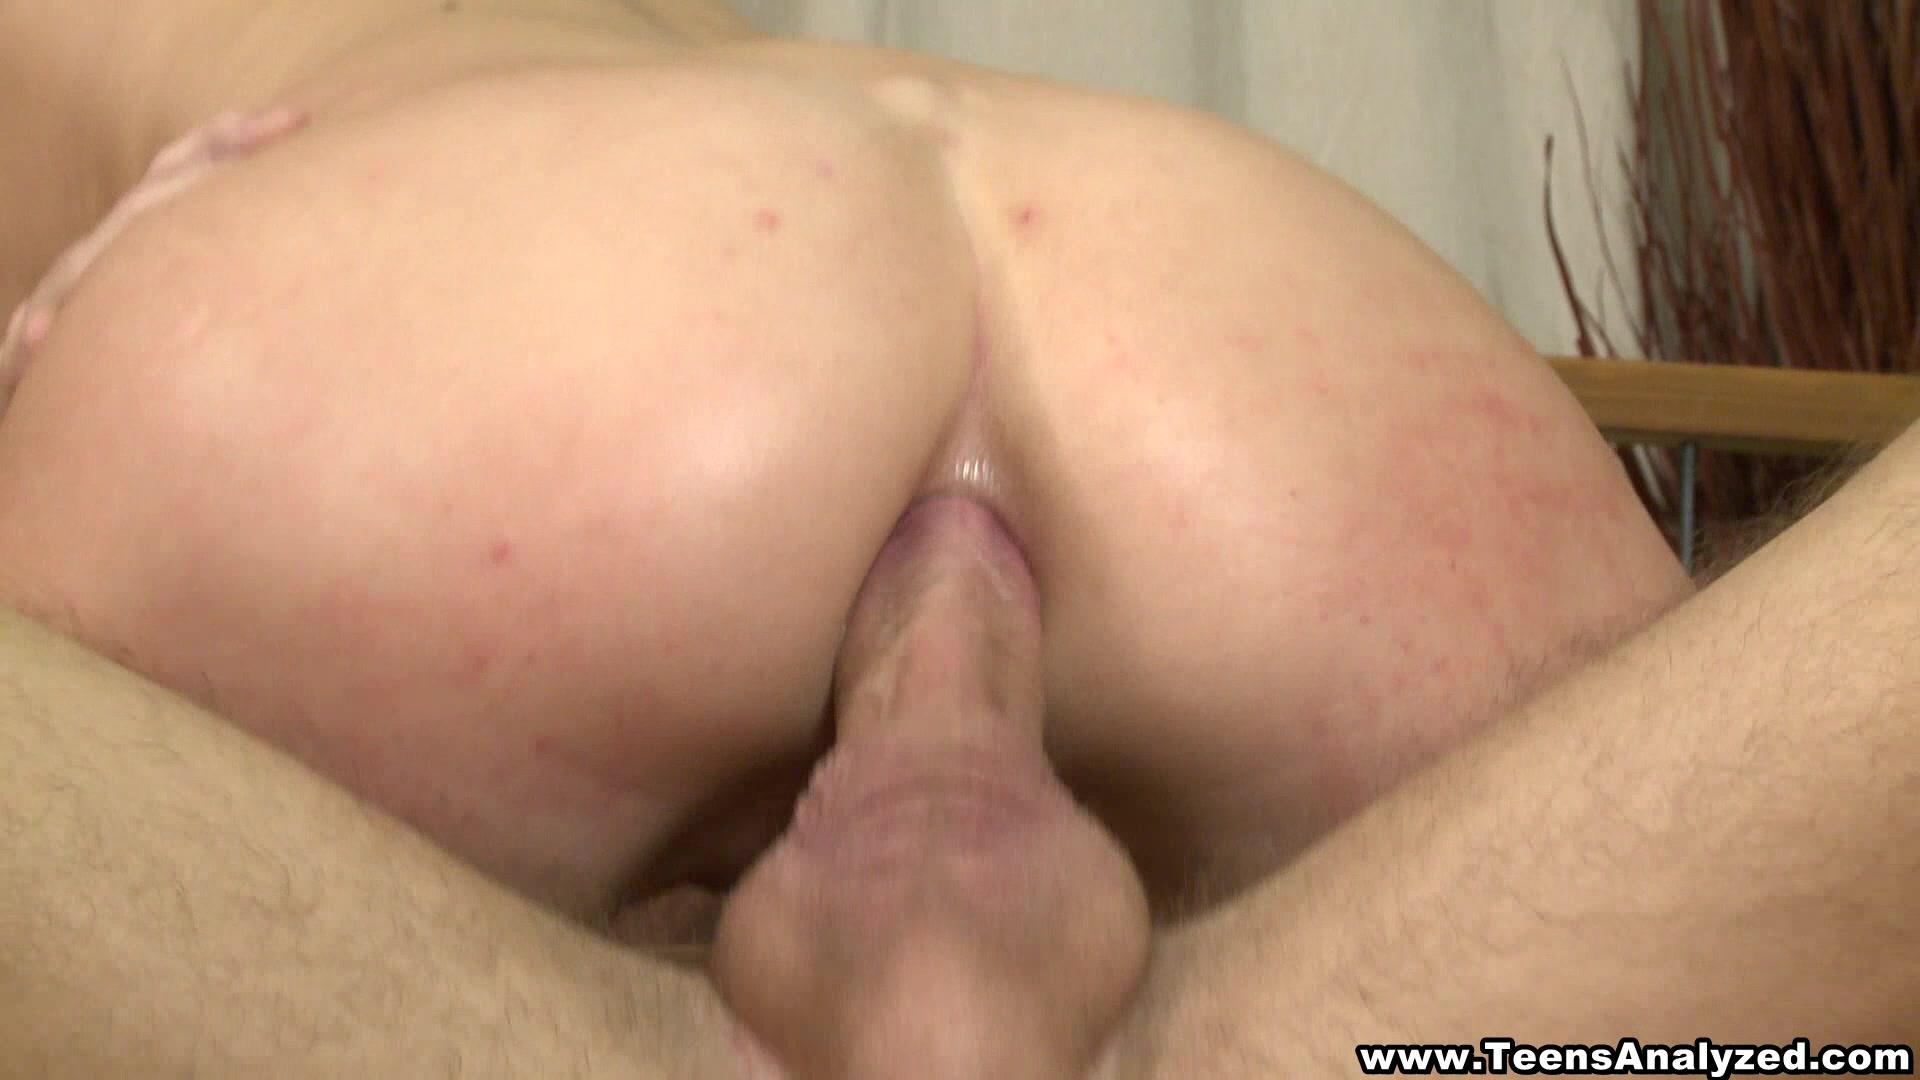 Nude pics Huge hanging tit pics